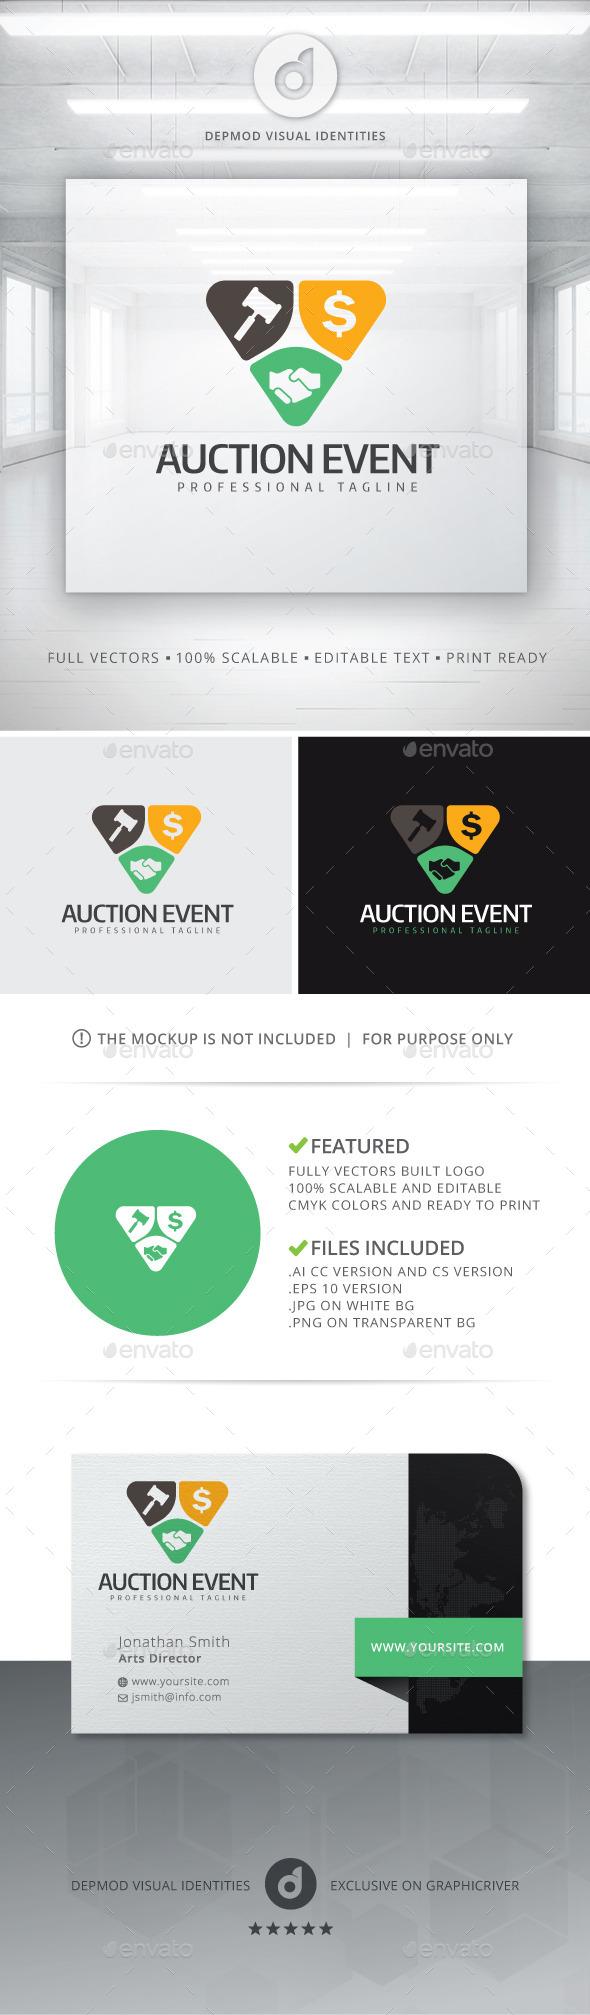 GraphicRiver Auction Event Logo 10930783